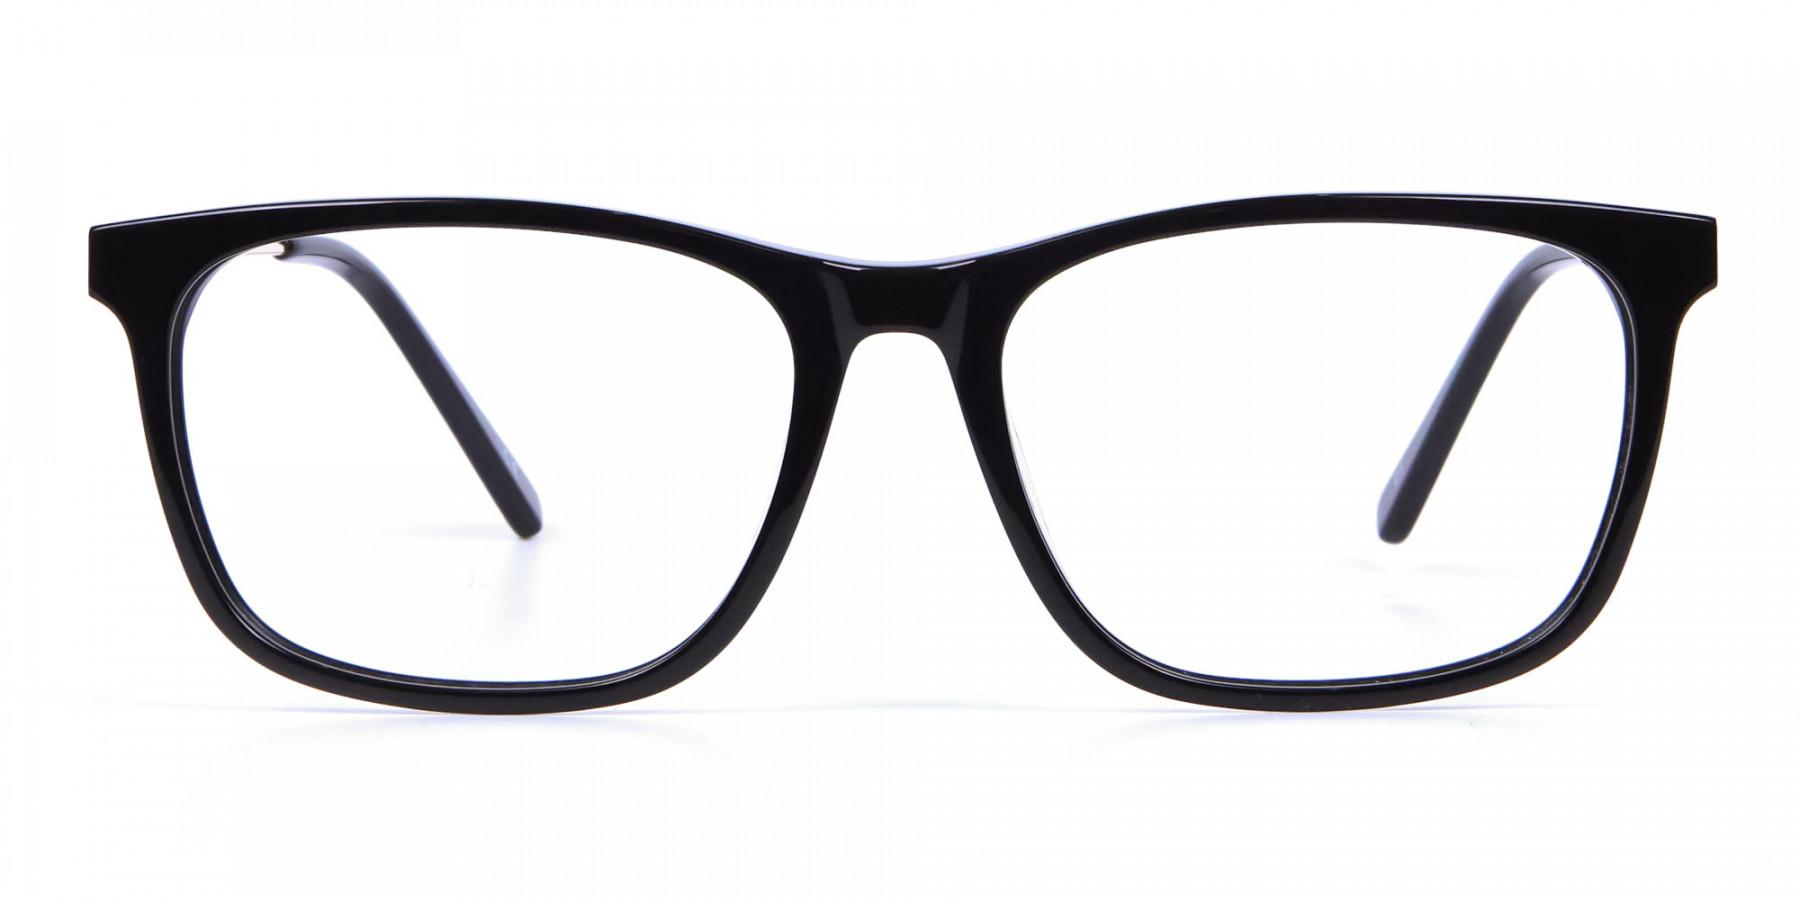 Mixed-Material Rectangular Glasses